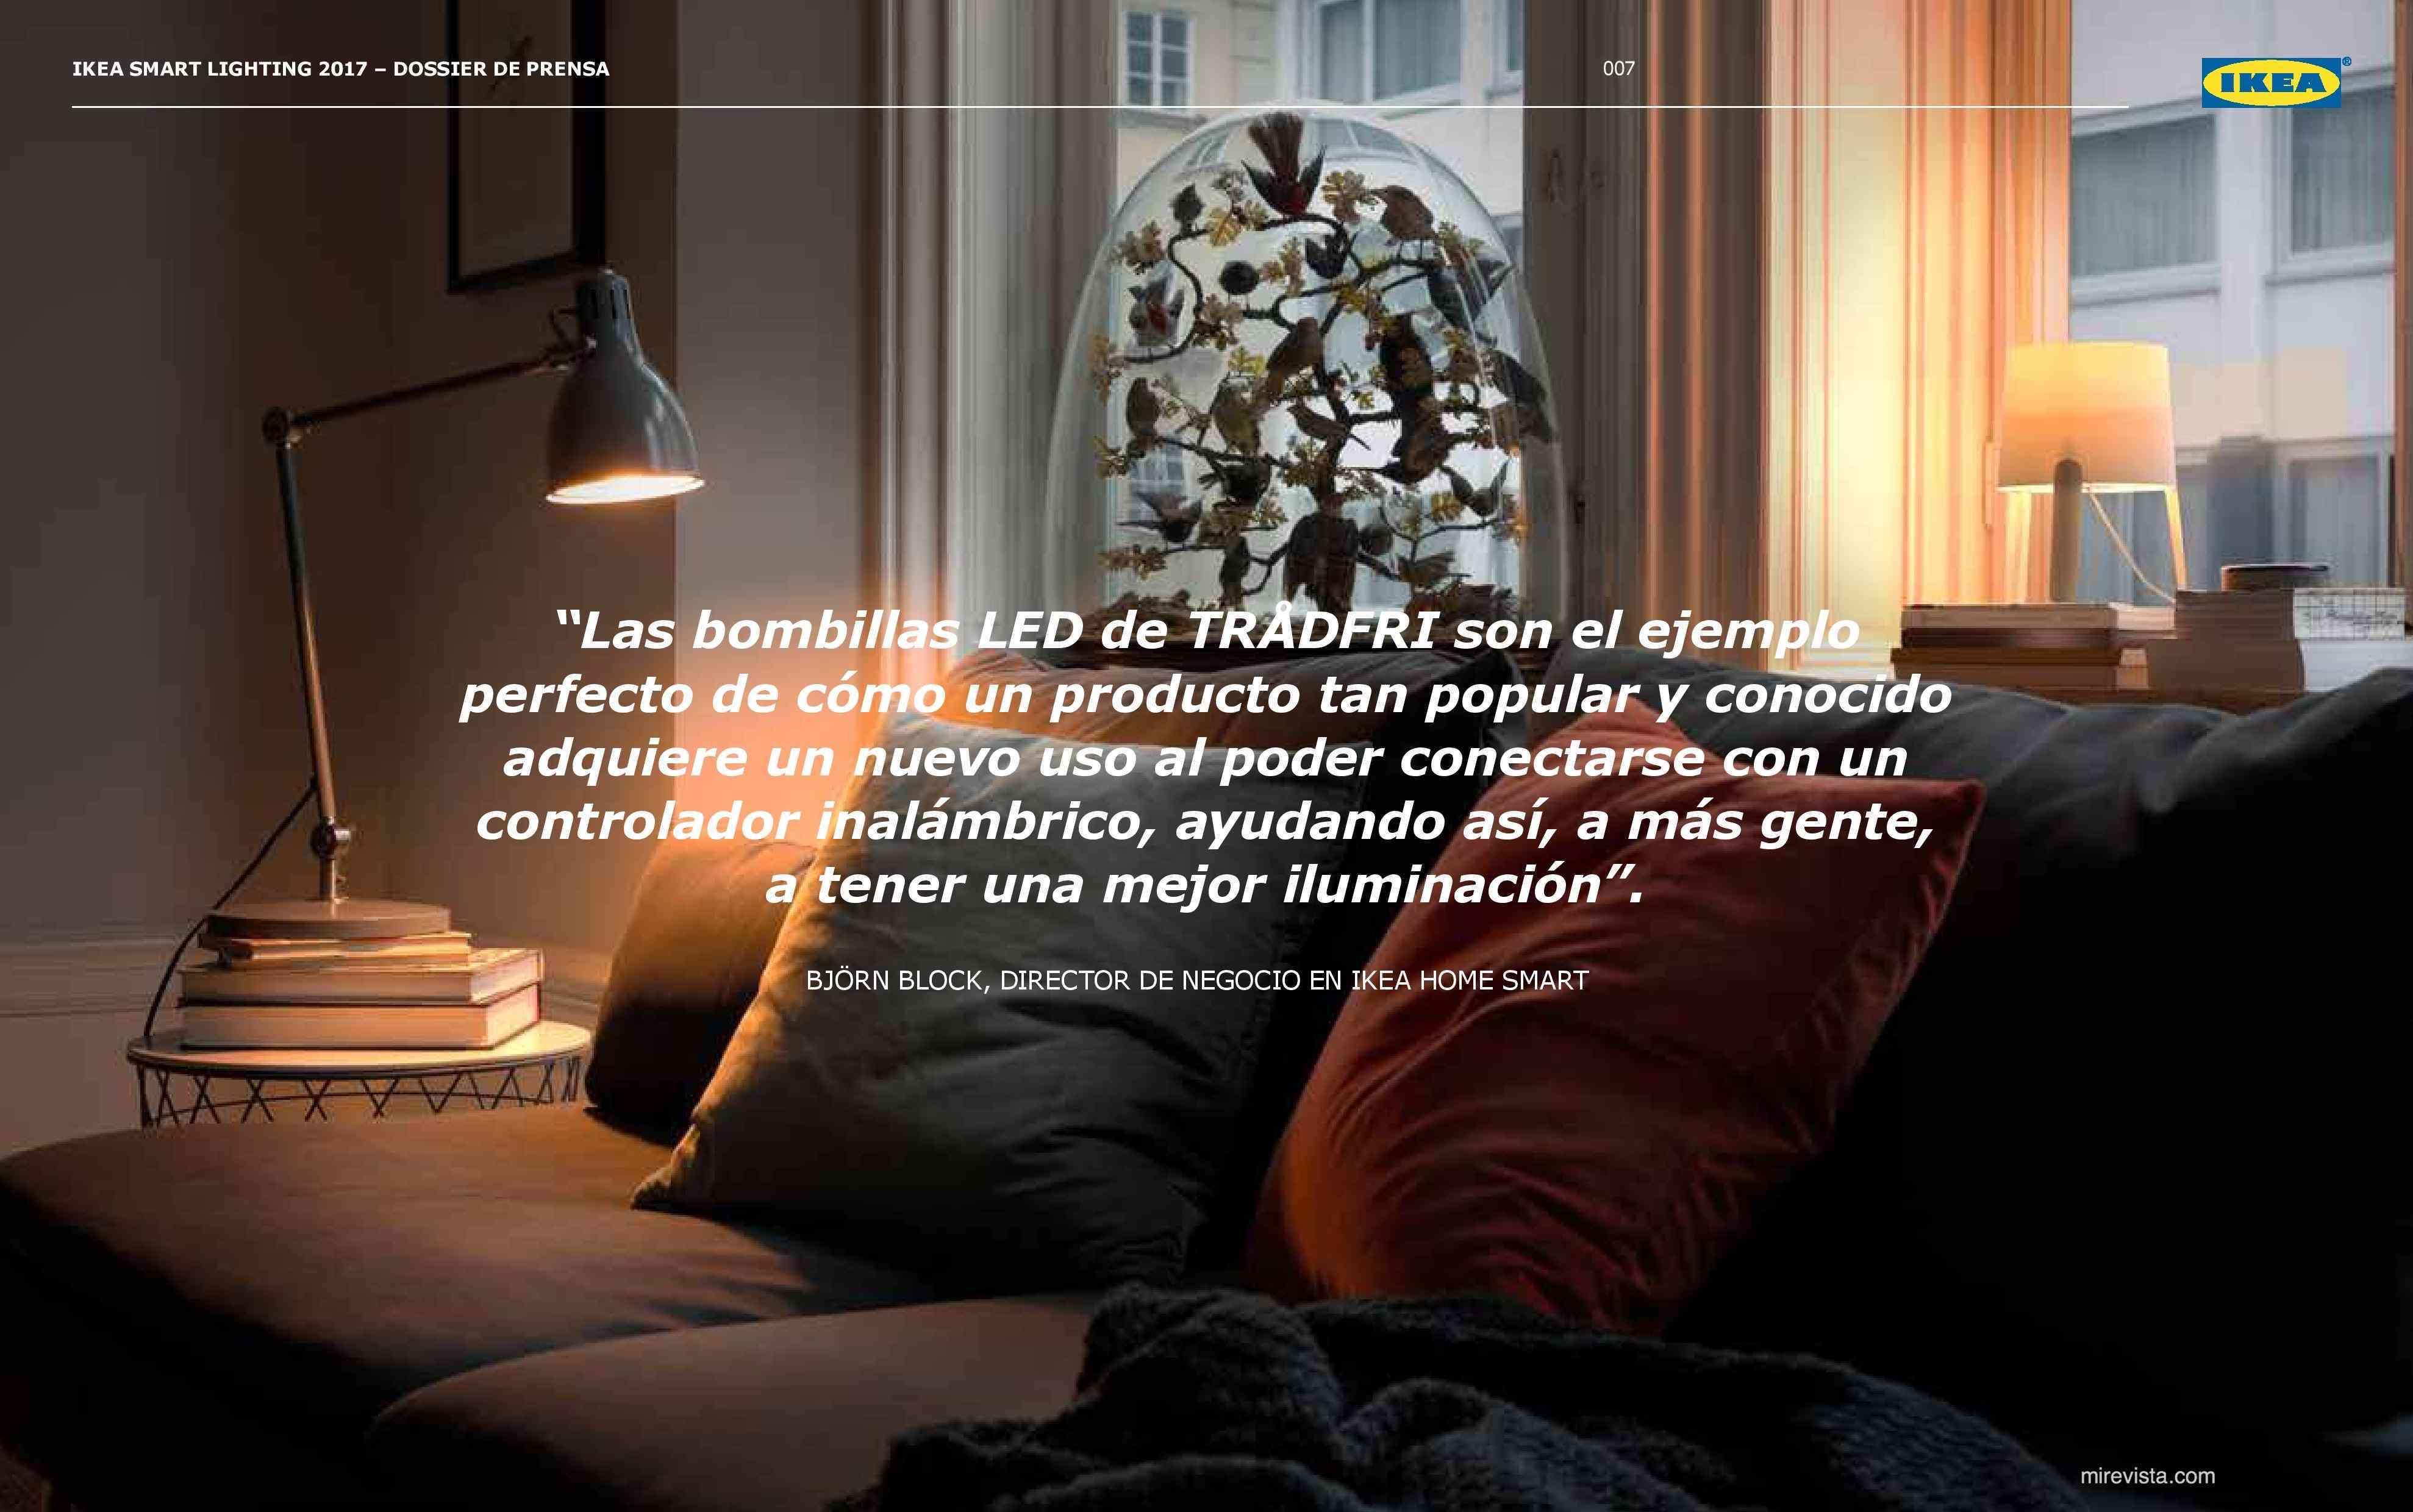 Novedades en iluminación de casas inteligentes con IKEA 63